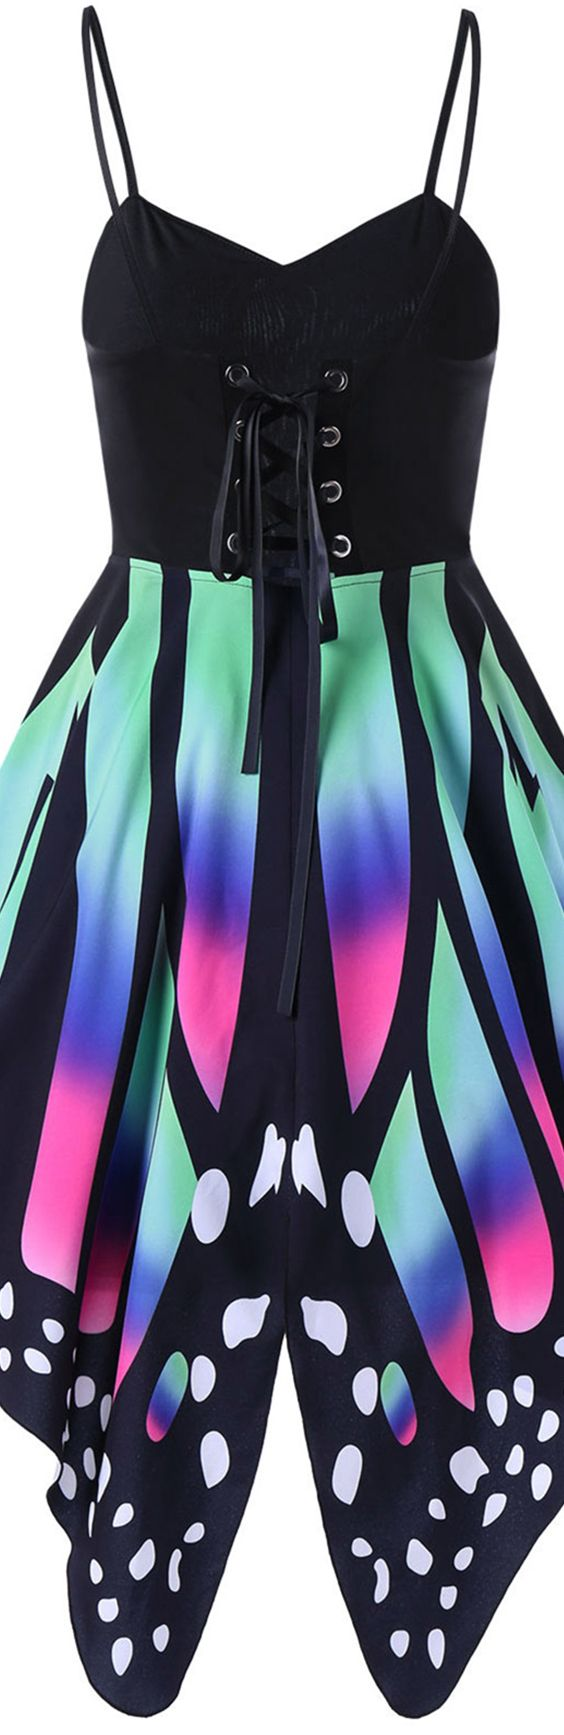 $19.32 Butterfly Print Lace Up Slip Dress